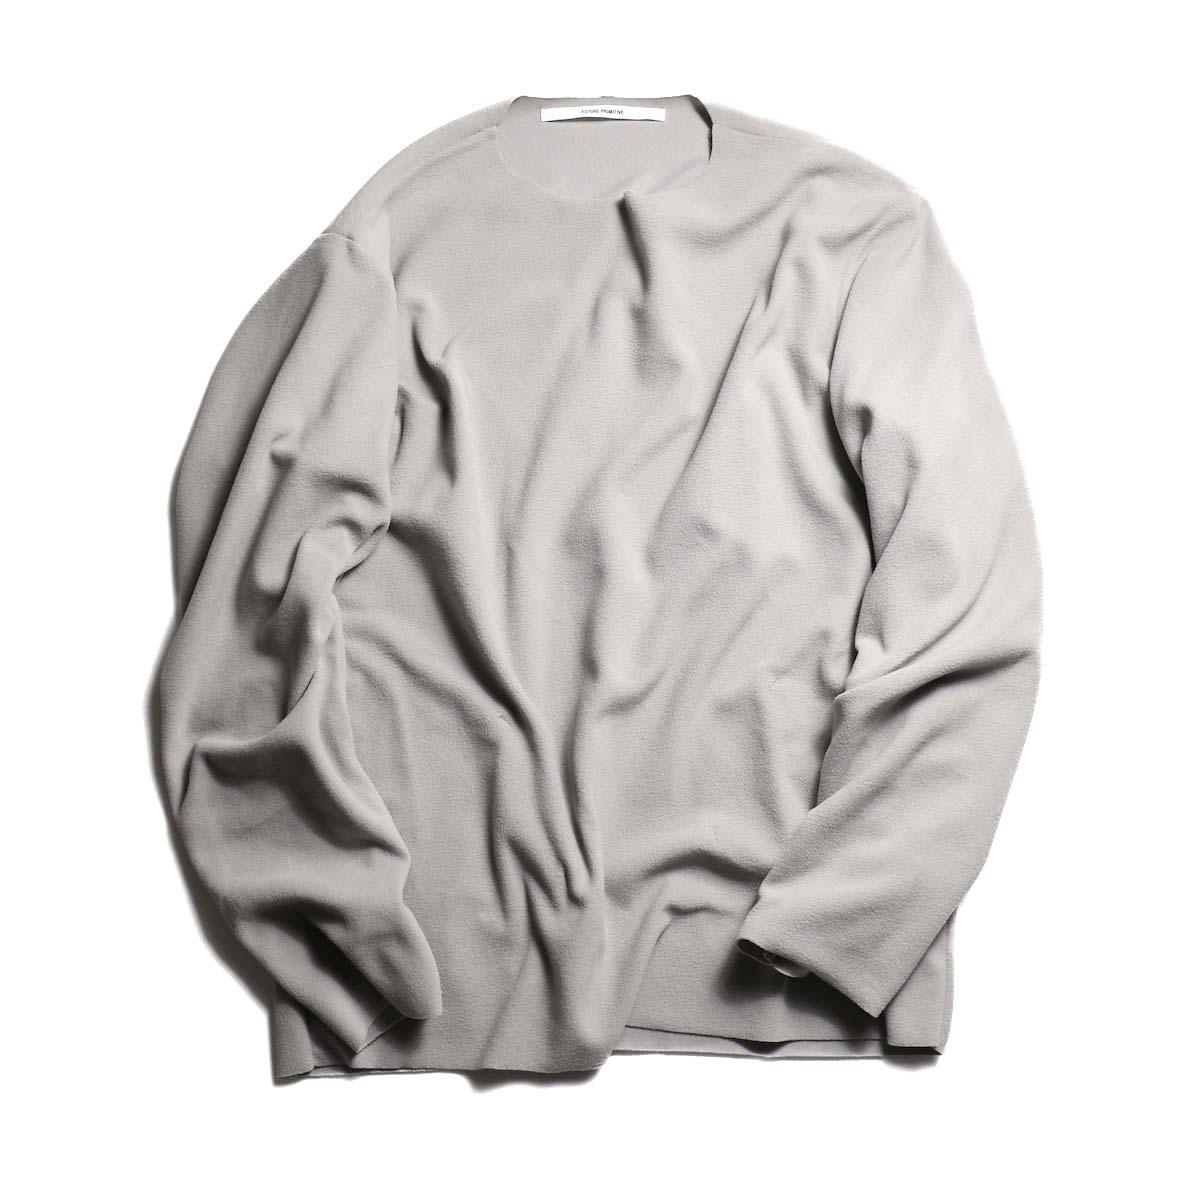 "FUTURE PRIMITIVE / Pullover Fleece ""Light"" -LT.GRAY"